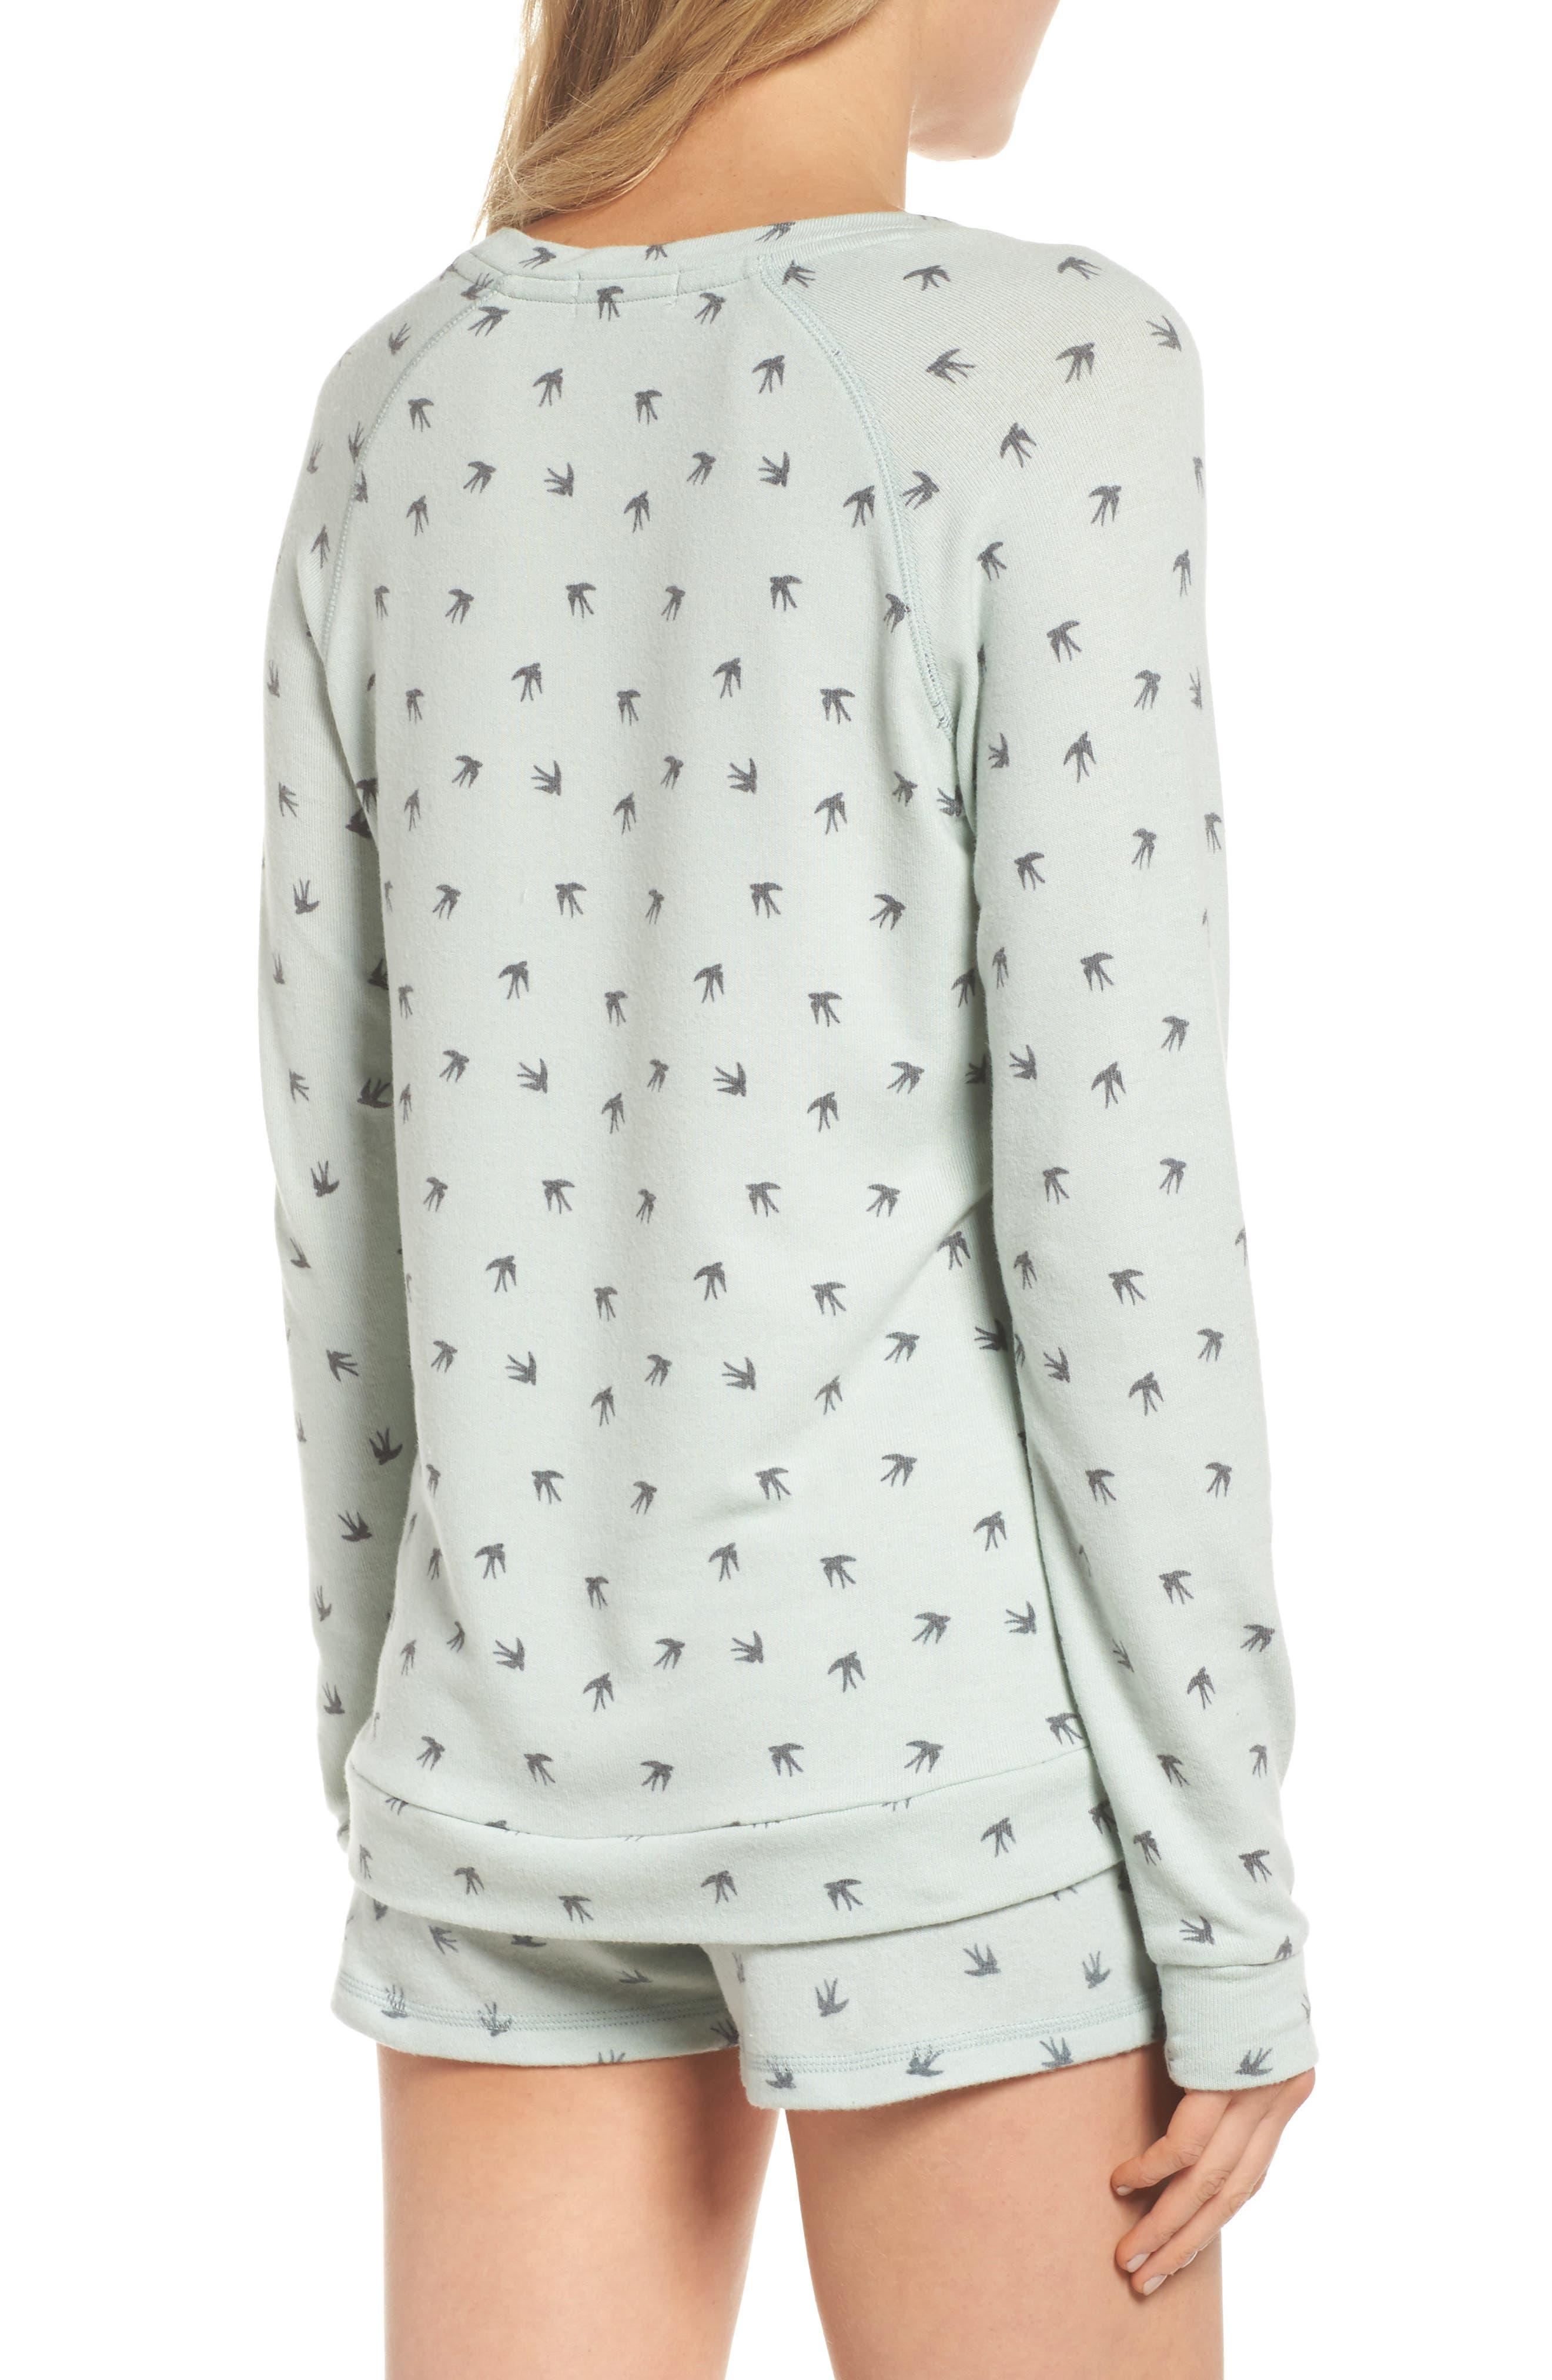 Peachy Pajama Top,                             Alternate thumbnail 2, color,                             Seafoam